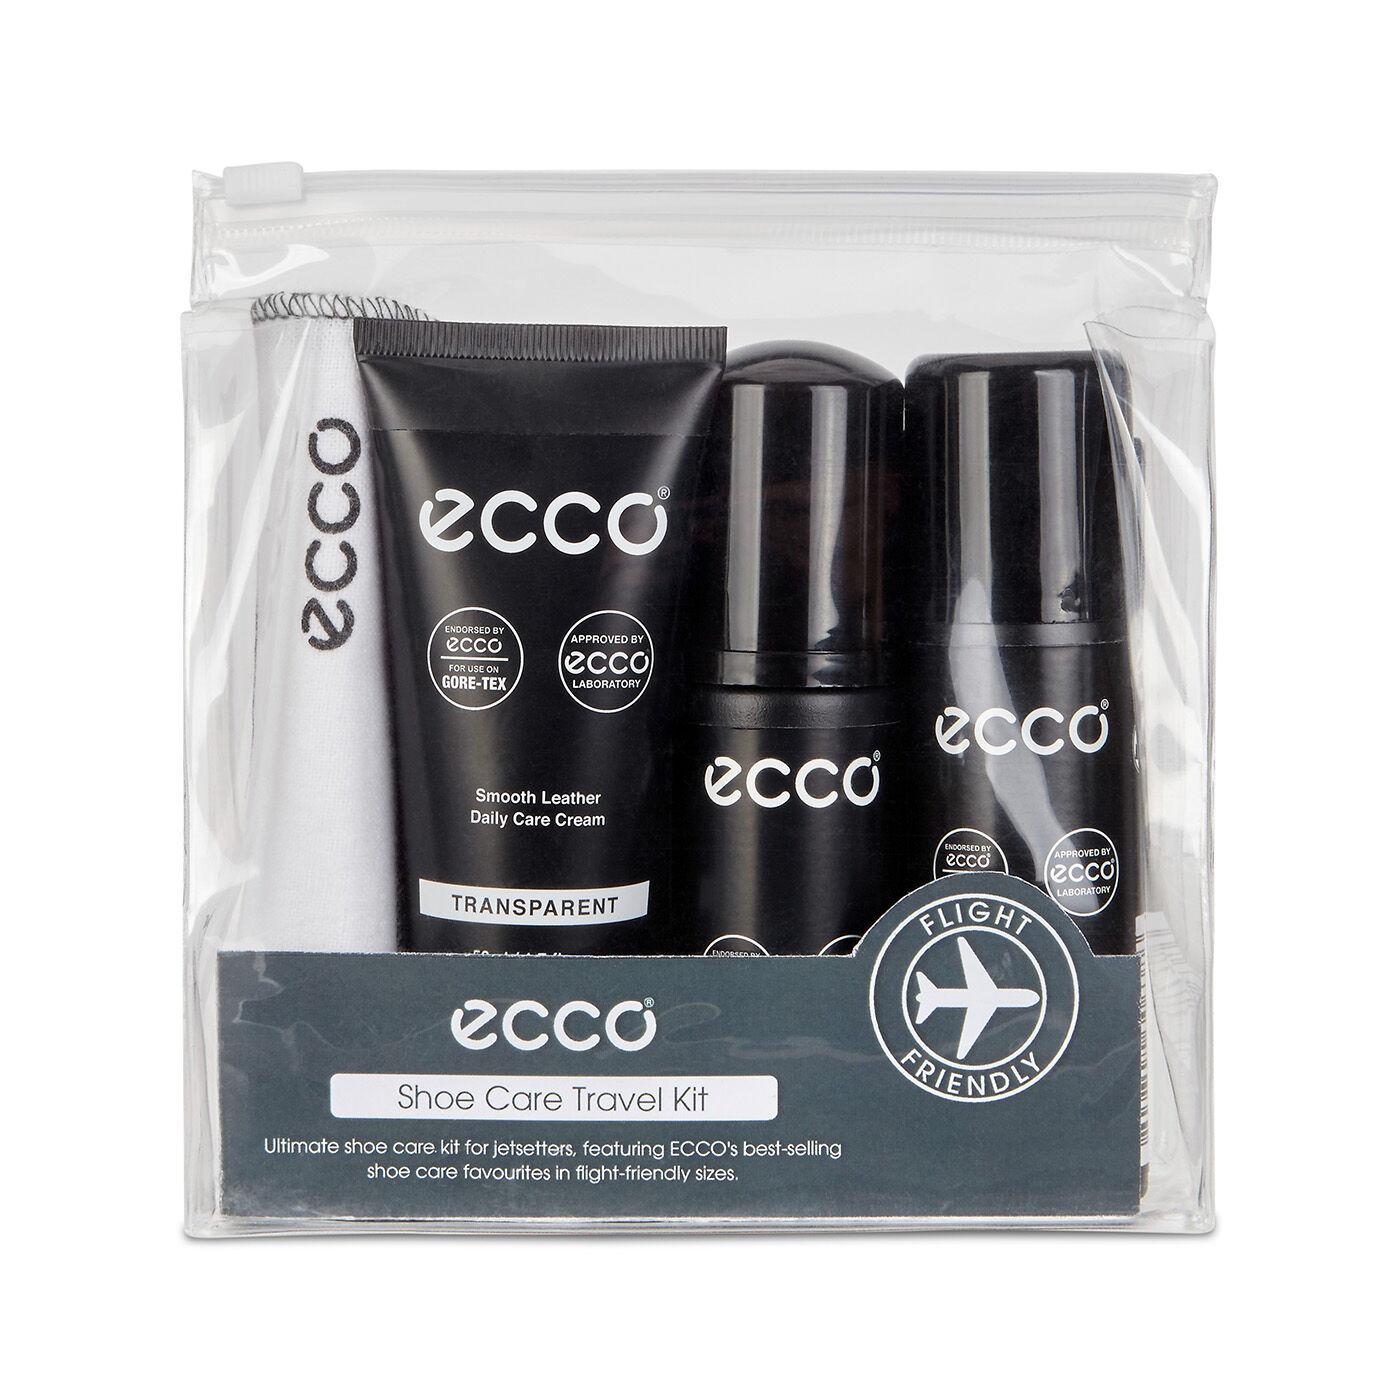 ECCO Shoe Care Travel Kit